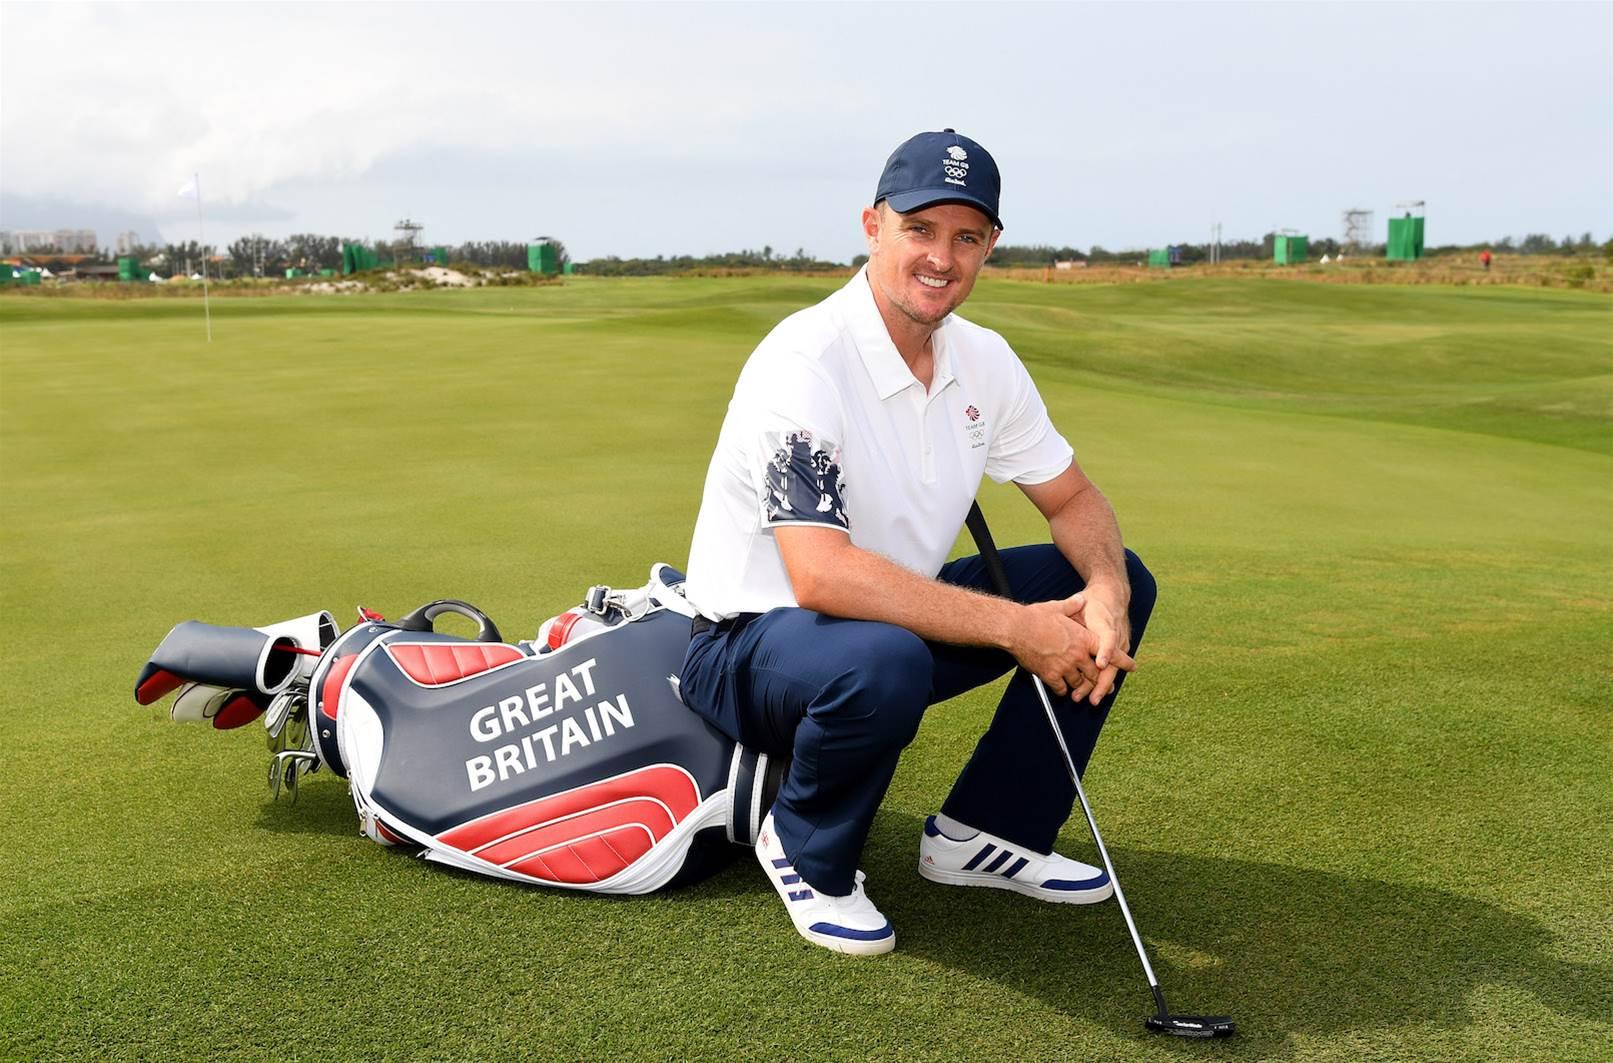 VIDEO: Rio ready for golf's return